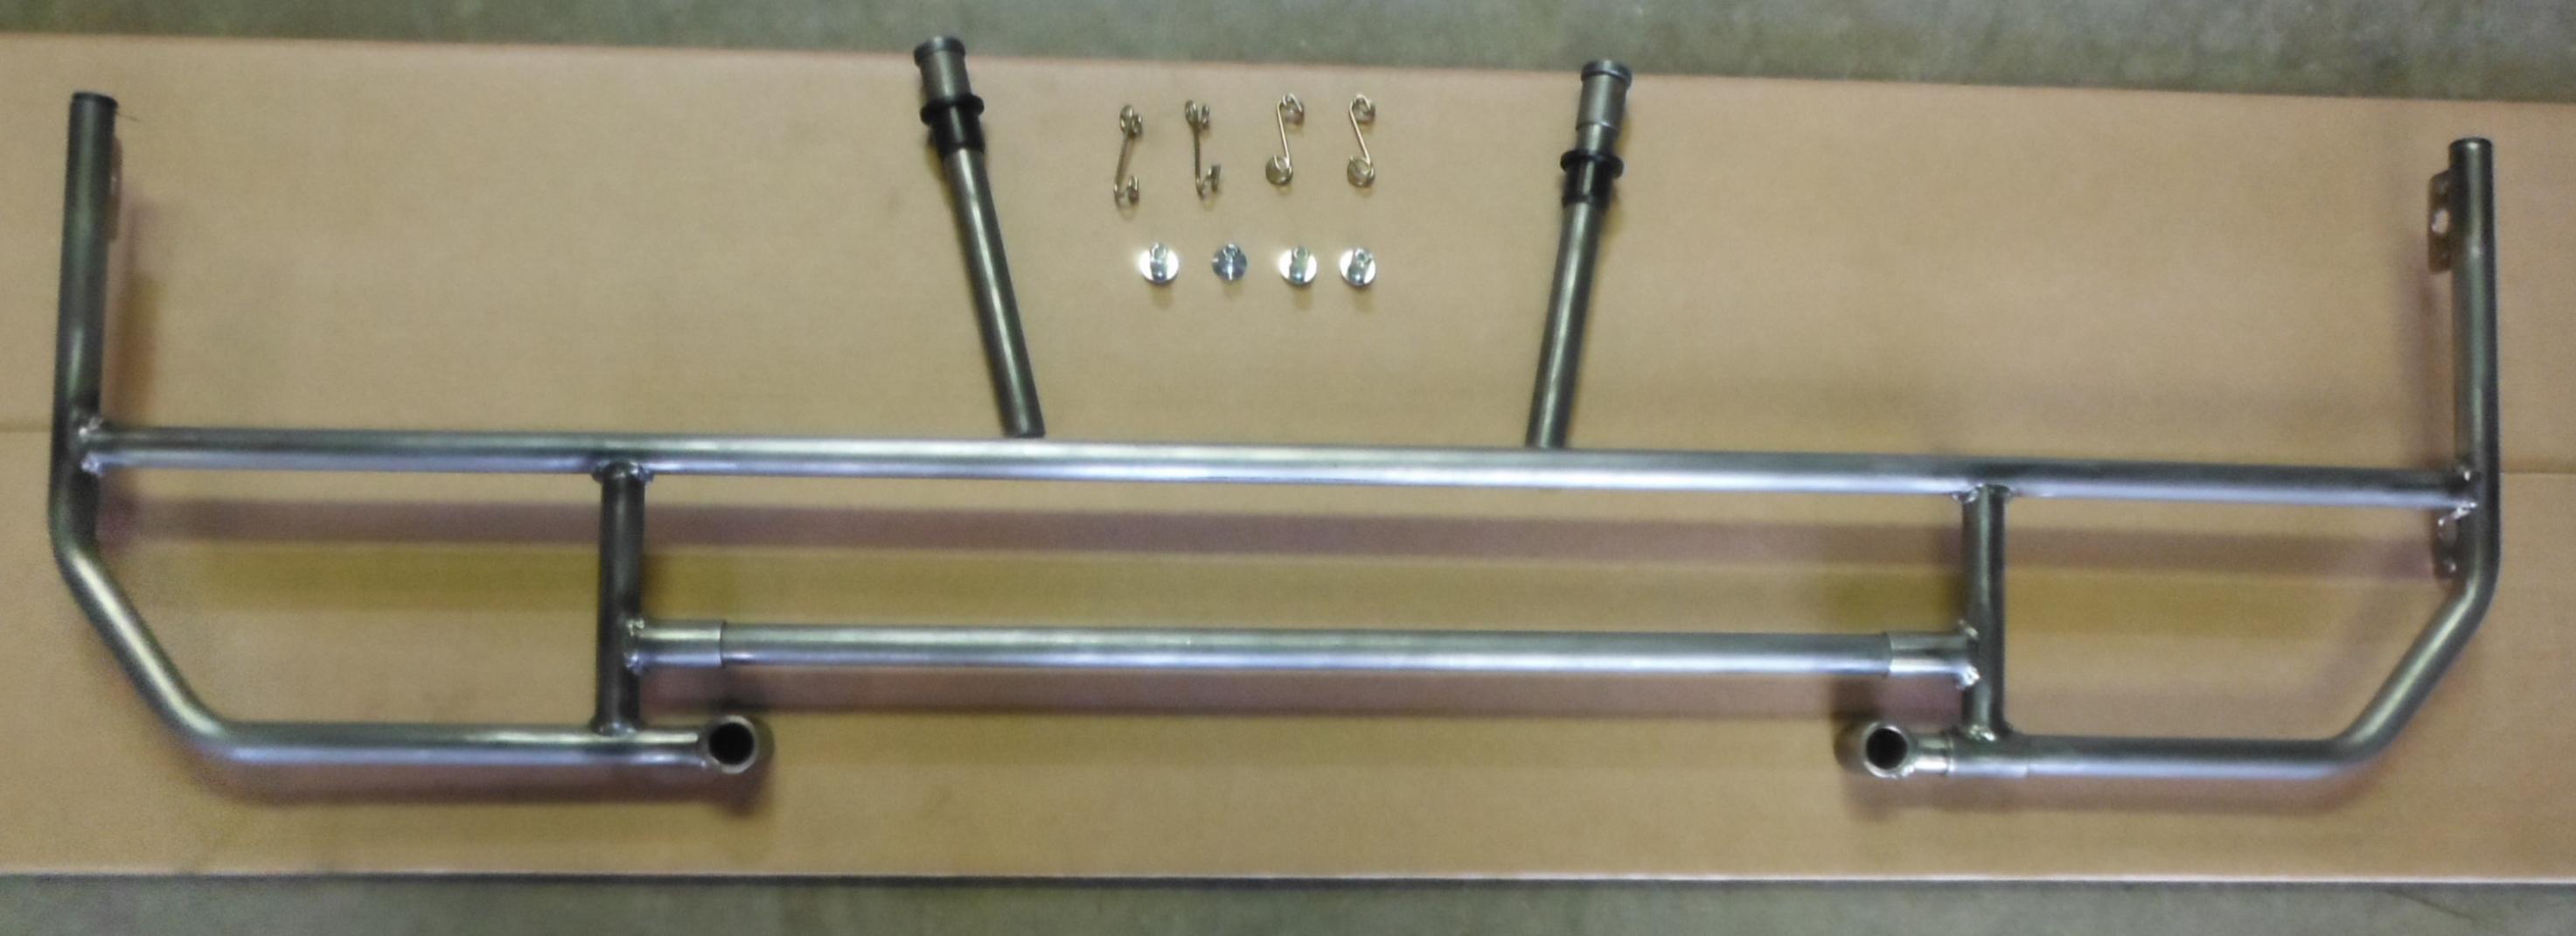 UAS Bumper kit